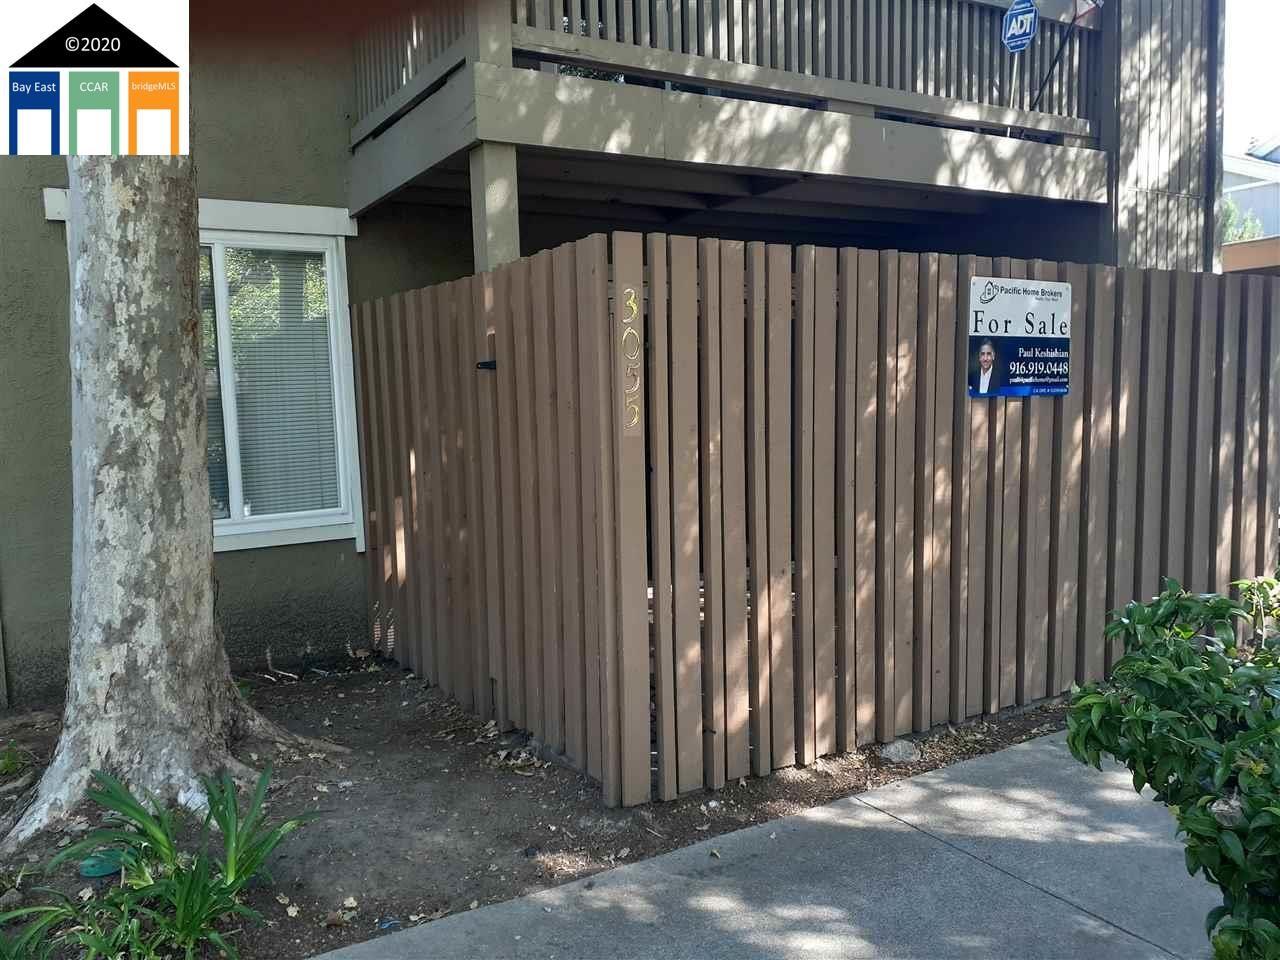 Photo of 3055 Treat Blvd #1, CONCORD, CA 94518 (MLS # 40906138)